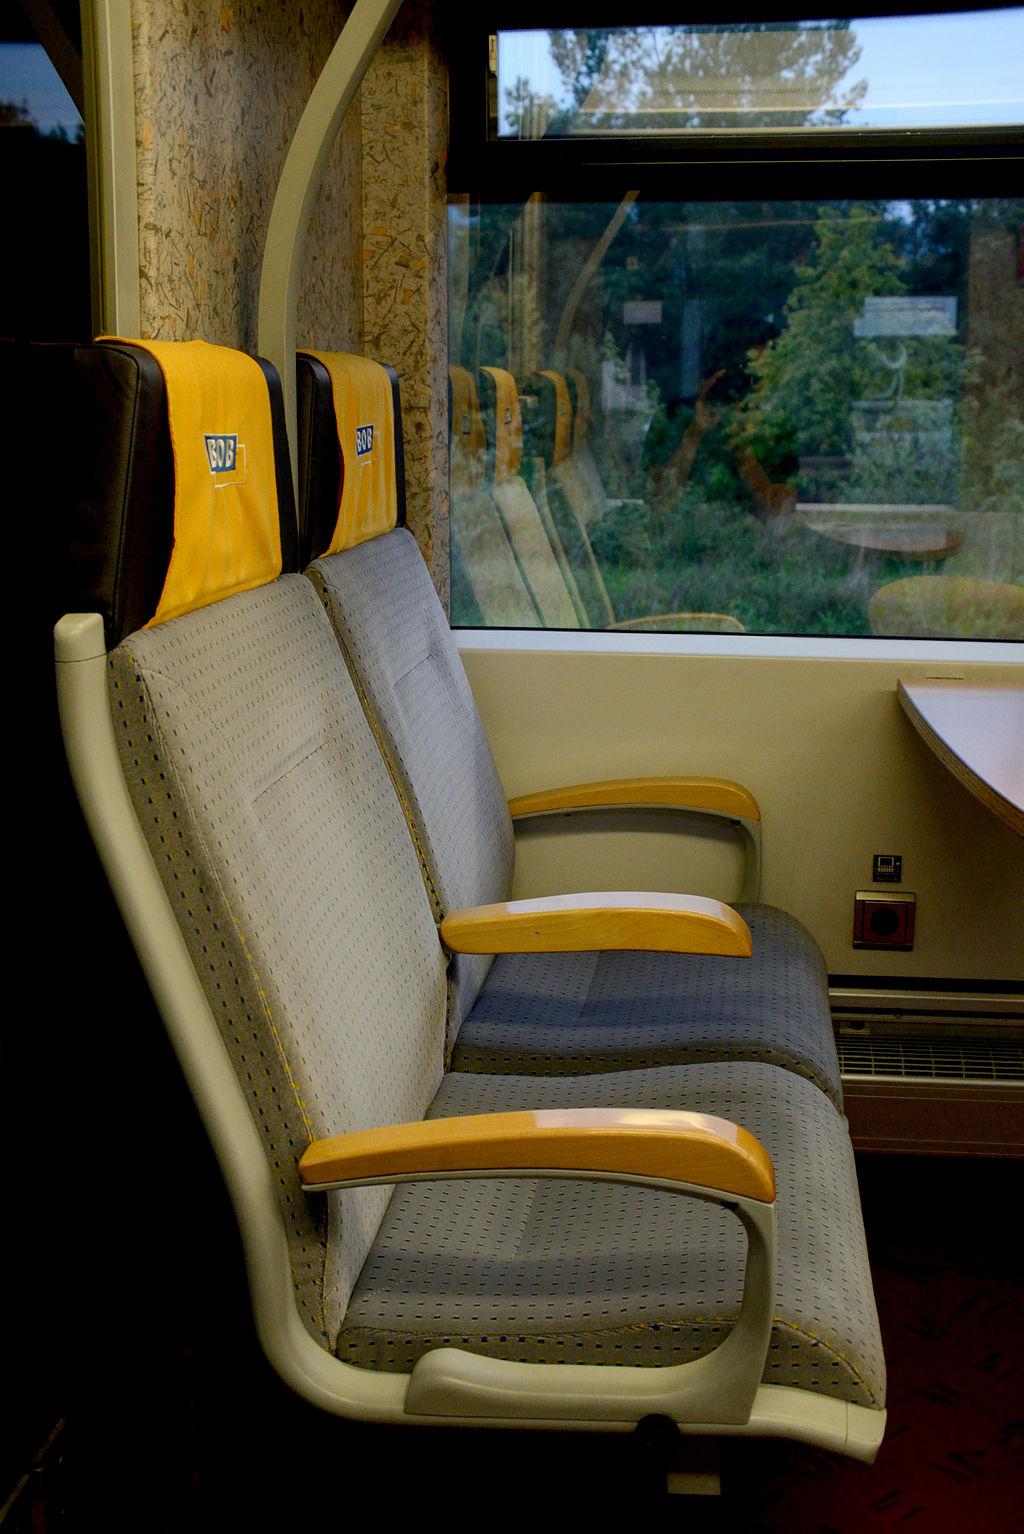 Bayerische_Oberlandbahn_Integral_interior_1st_class_002.JPG